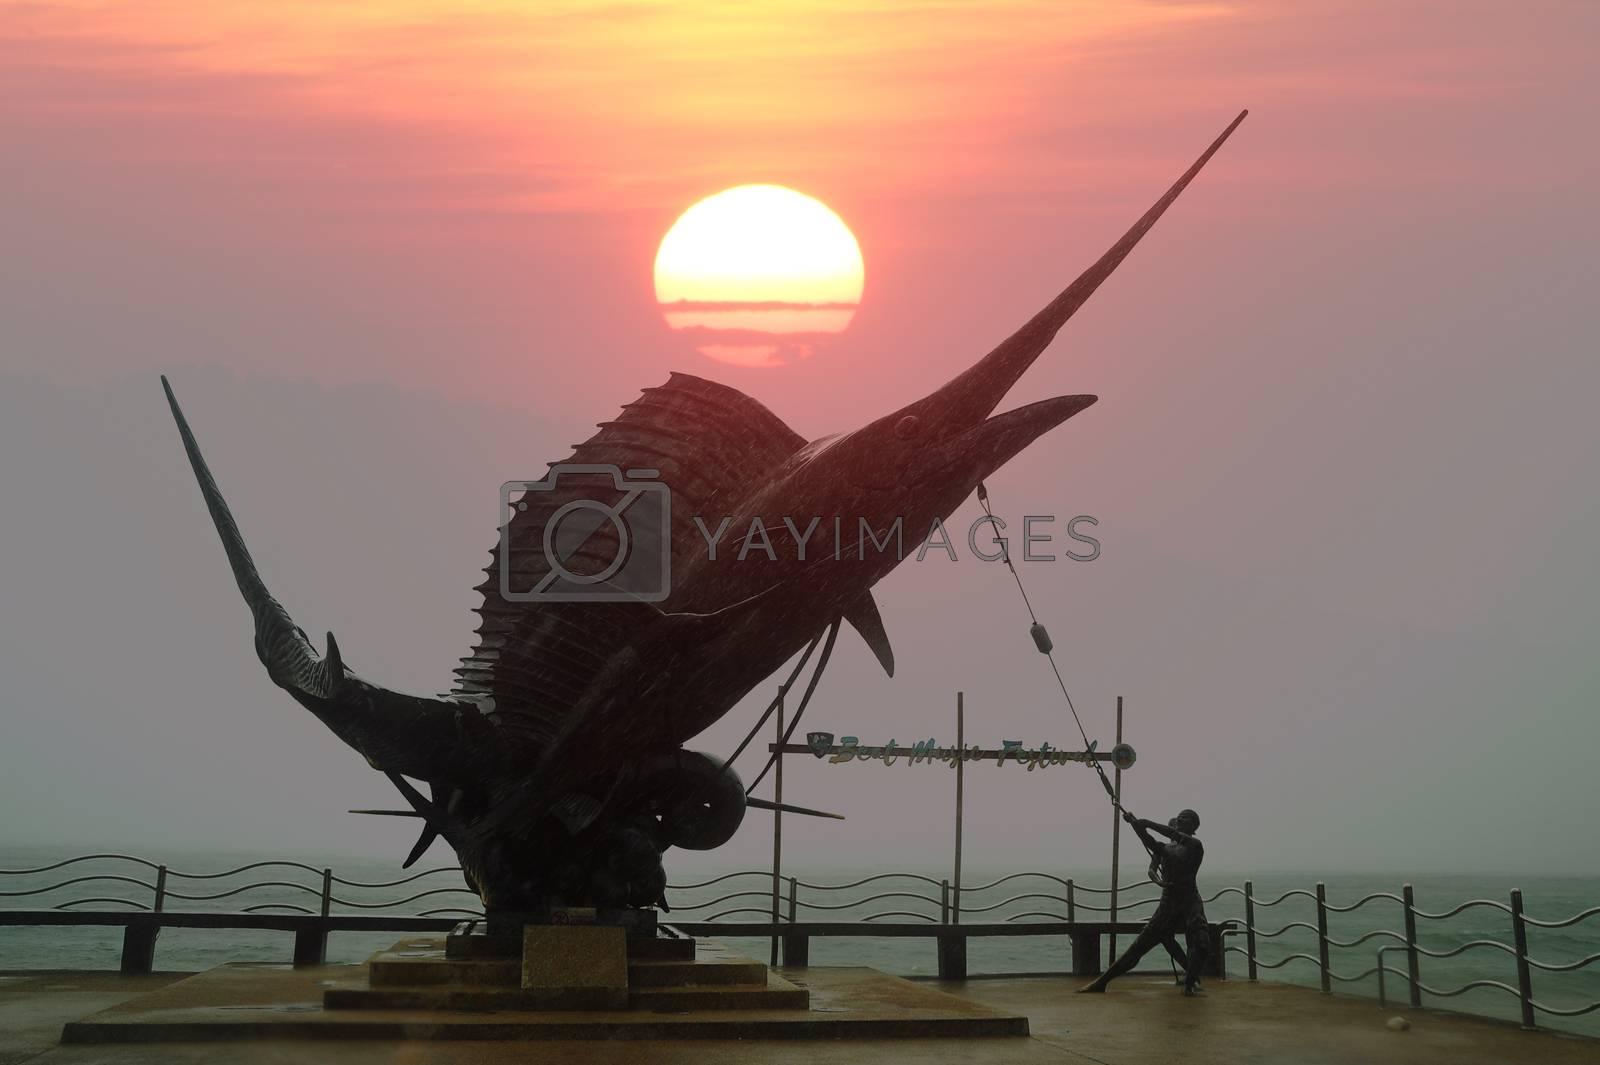 KRABI, THAILAND - JUNE 17 2018 : Statue of Marlin Fish landmarks at Ao Nang Beach, Krabi Province, Thailand